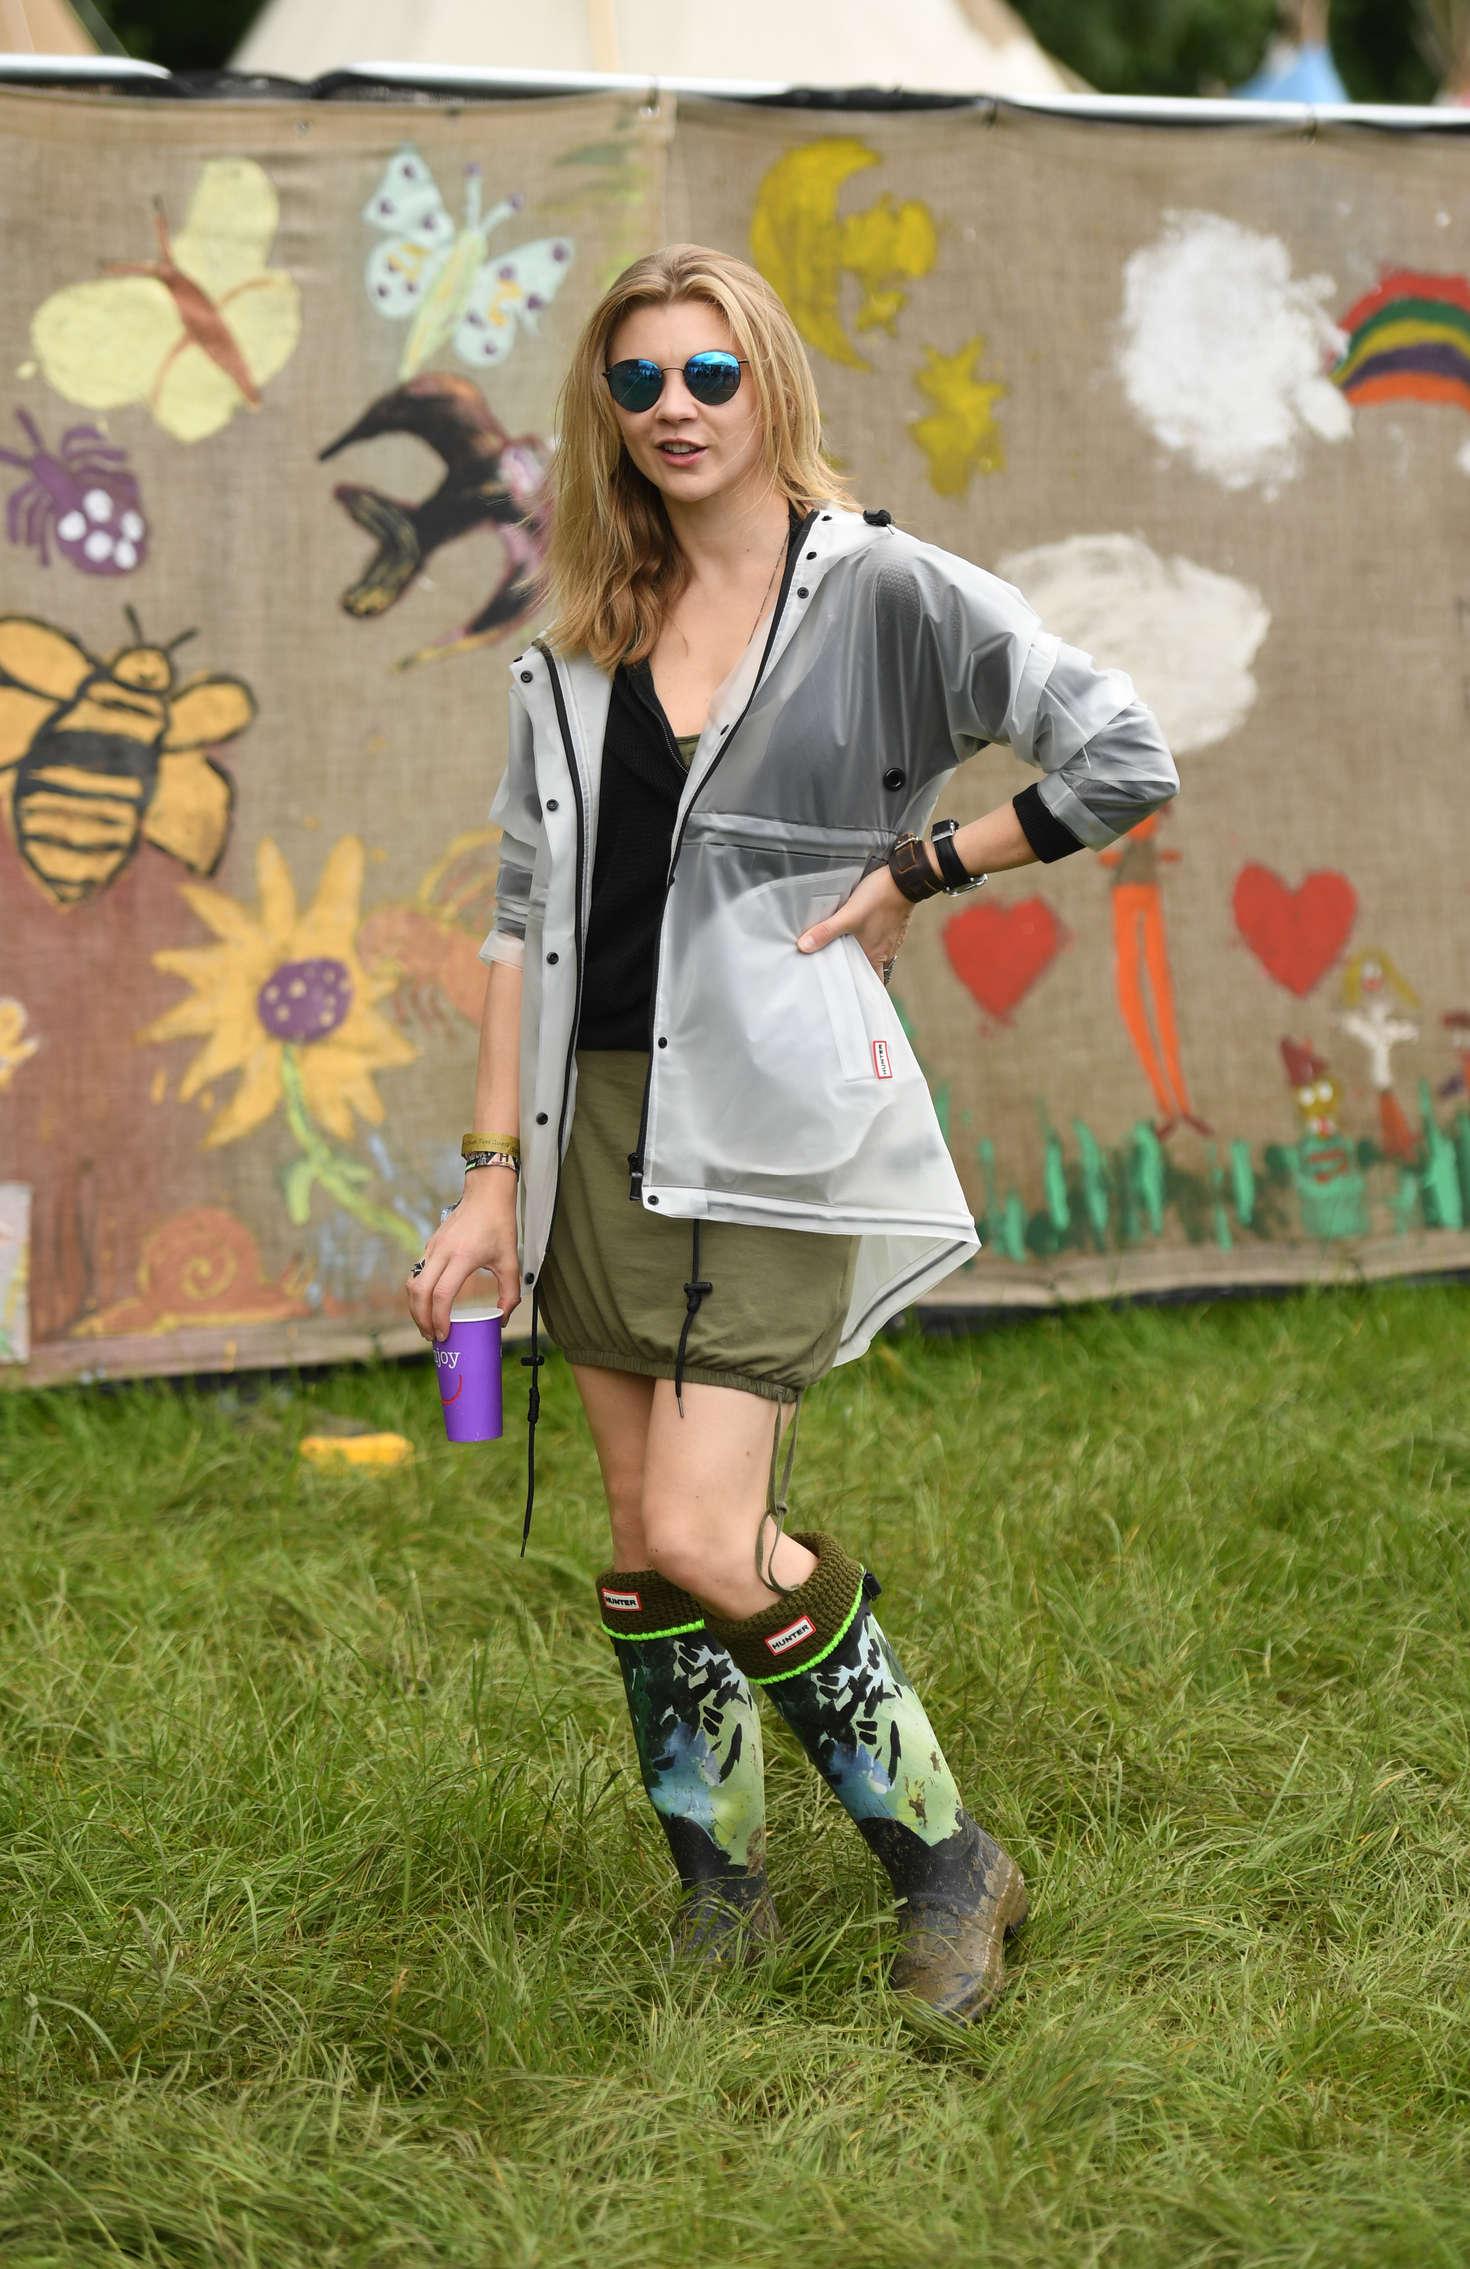 Natalie Dormer 2016 : Natalie Dormer: Visits the 2016 Glastonbury Festival -02